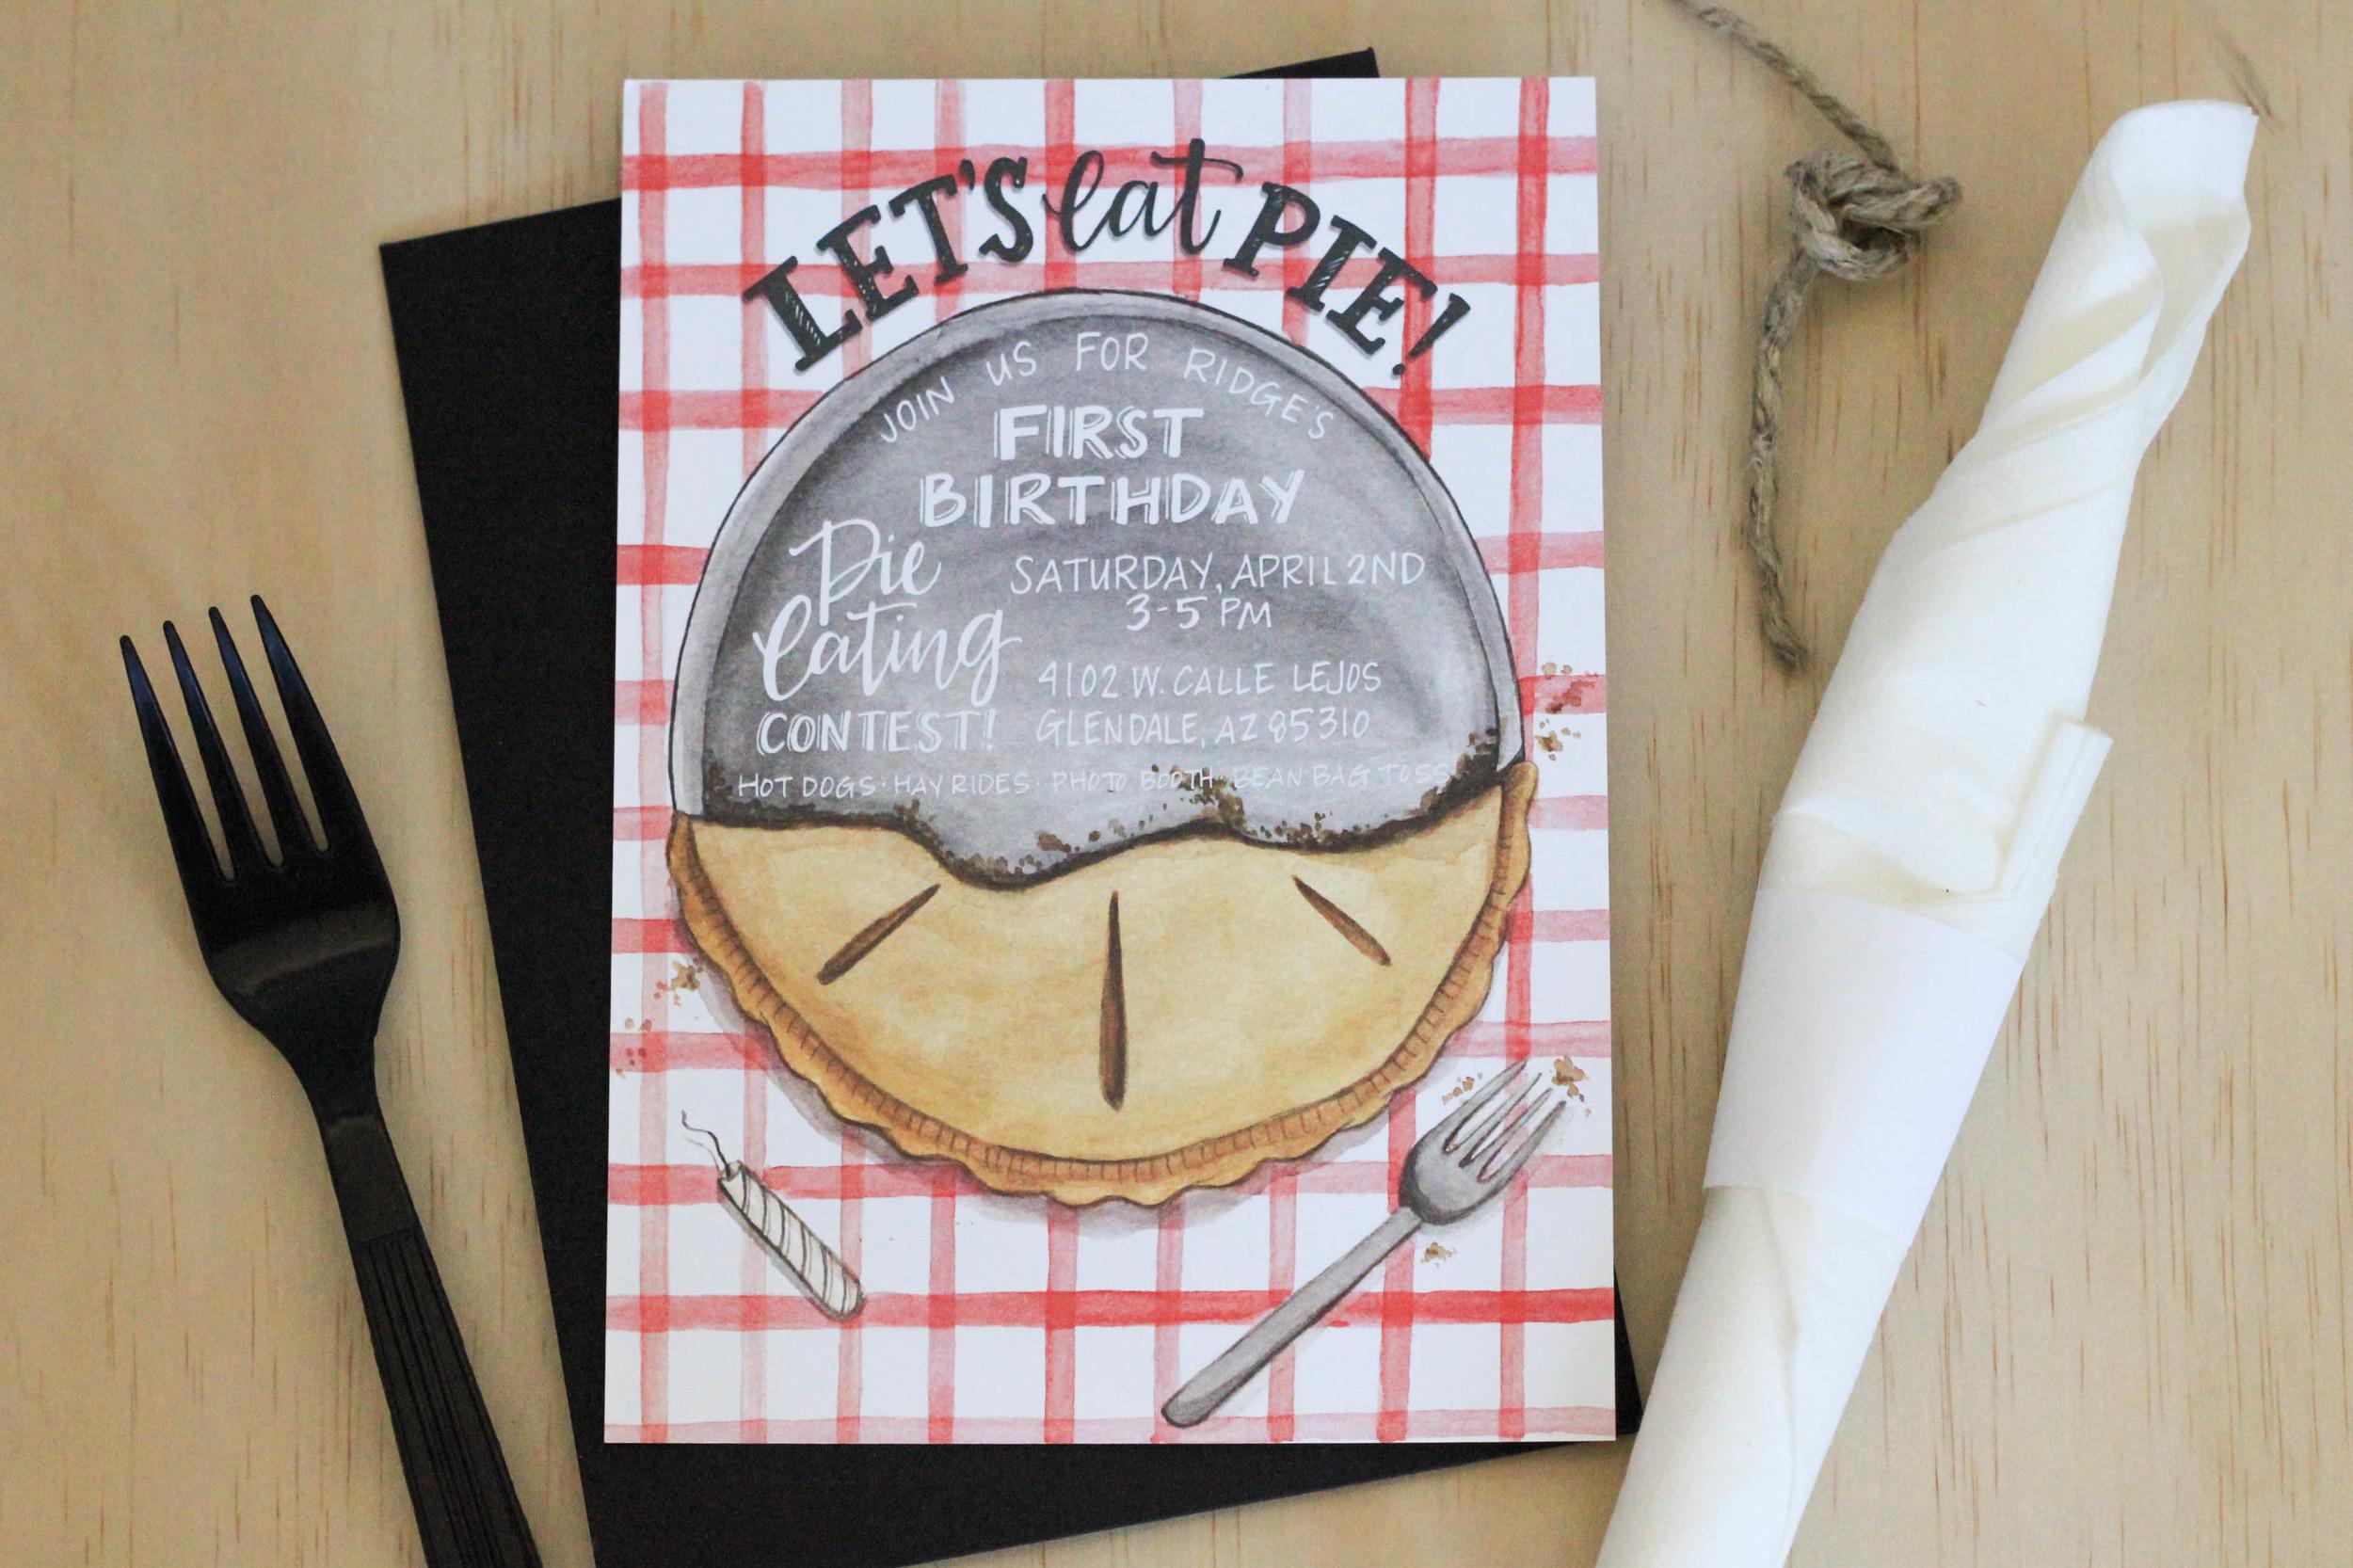 Lets eat pie invite.jpg